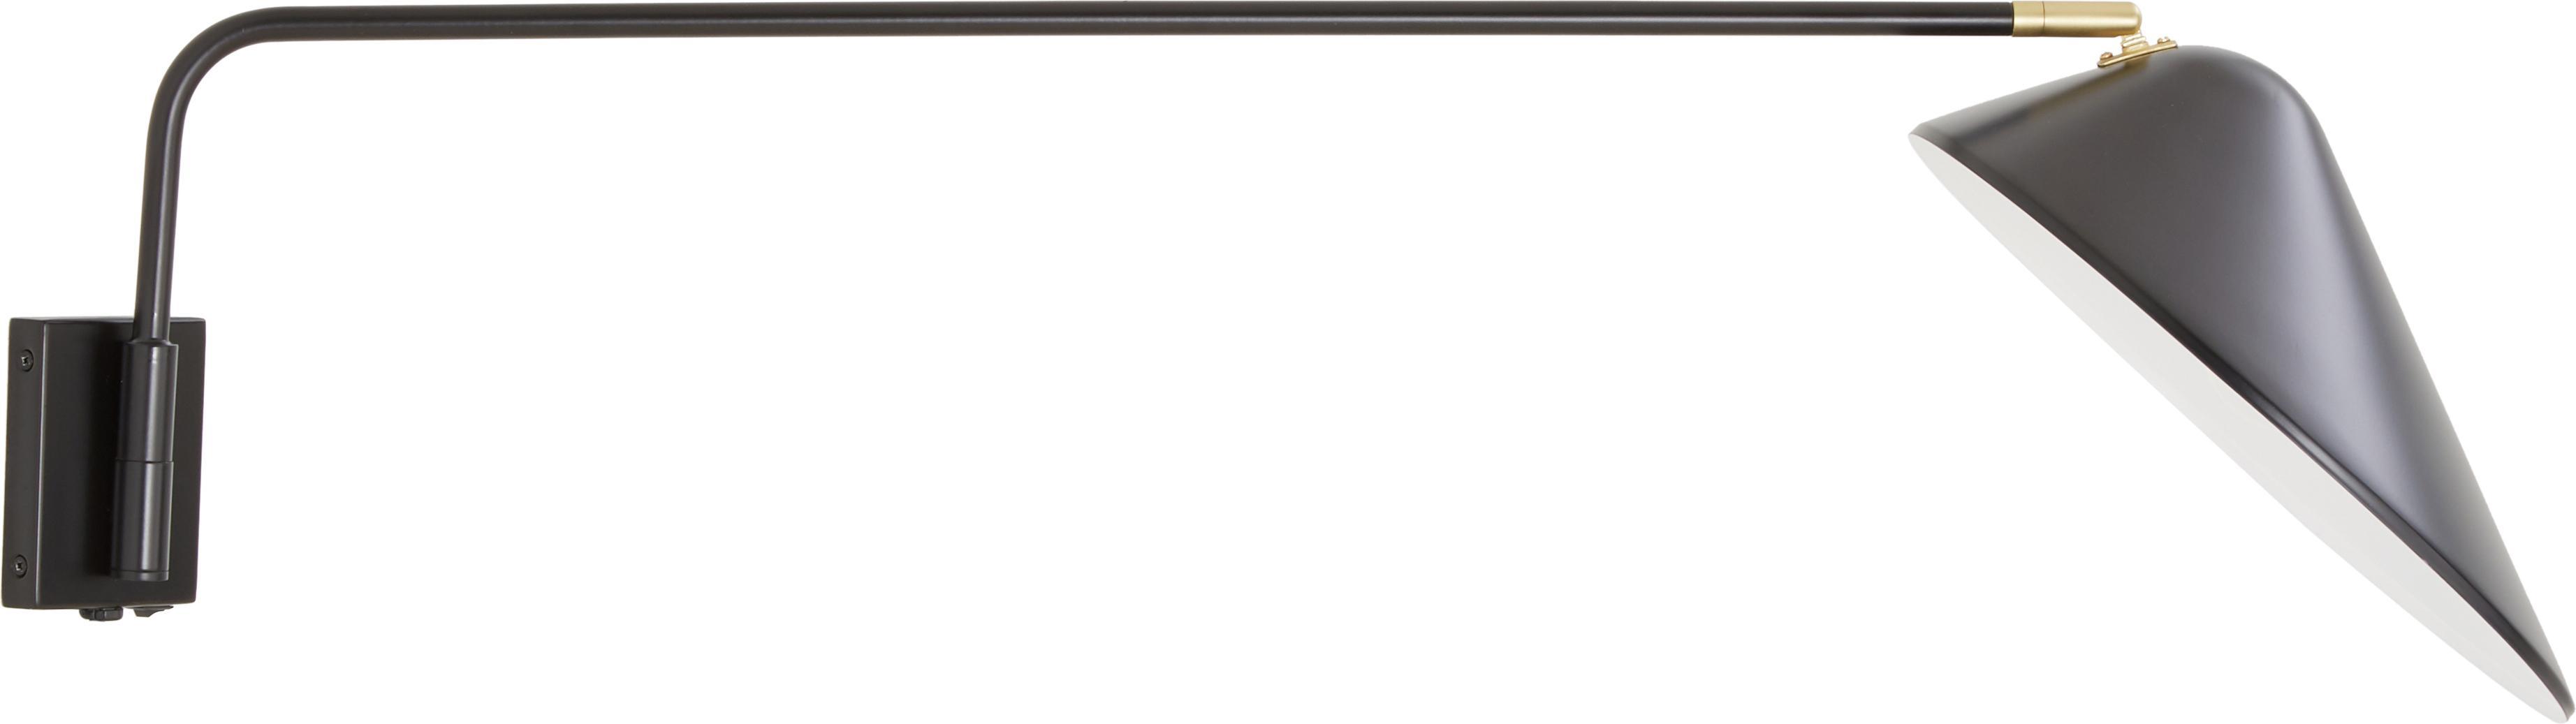 Wandlamp Neron met stekker, Lampenkap: gepoedercoat metaal, Baldakijn: gepoedercoat metaal, Zwart, 27 x 15 cm